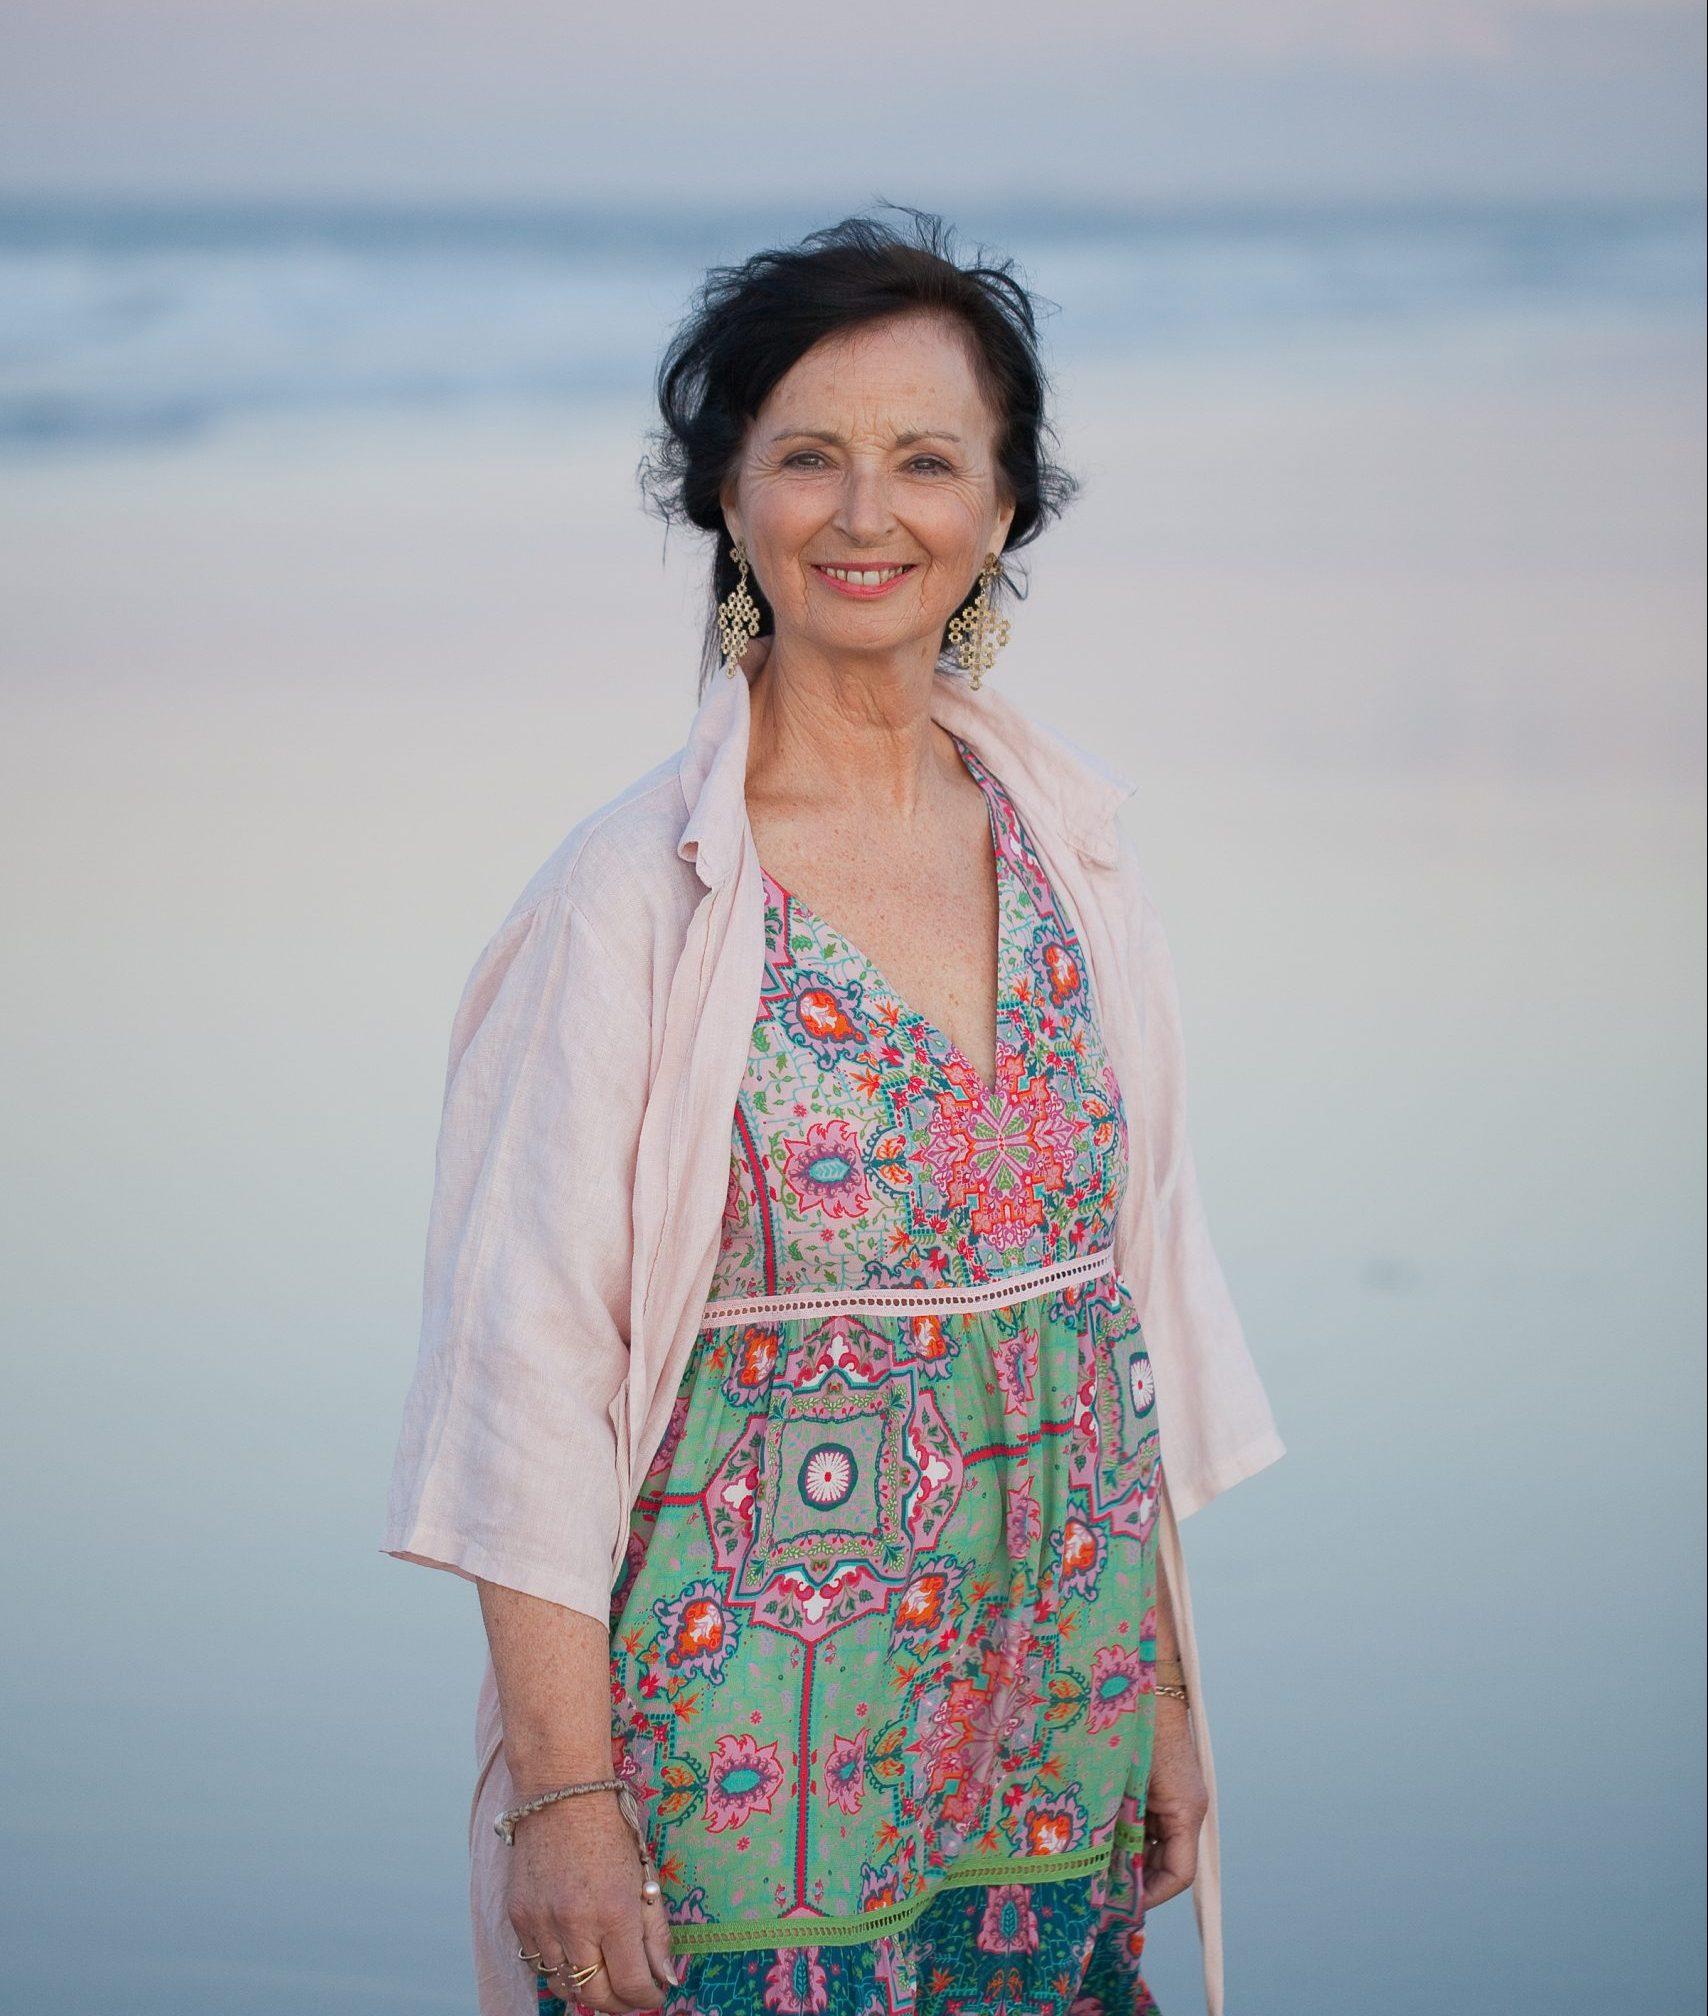 Josephine Hickman Beautiful Minds Hypnotherapy About Me RTT Therapist